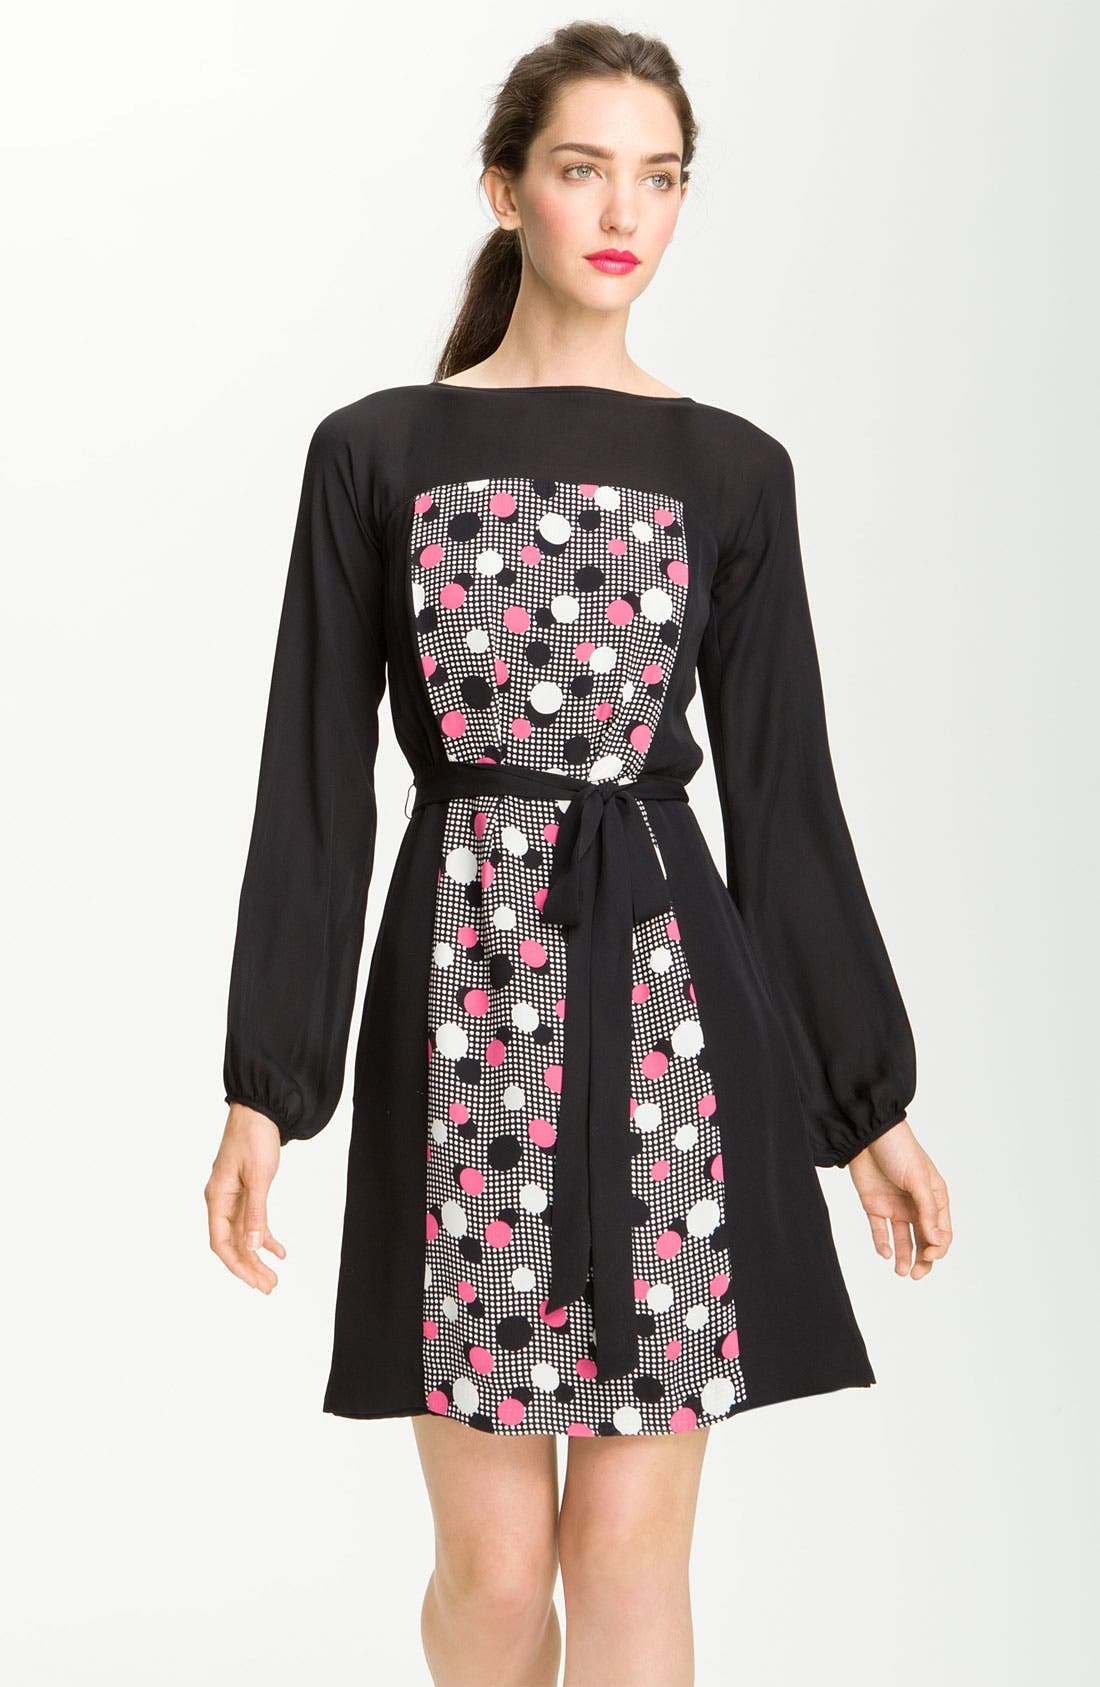 Main Image - Milly 'Deco Dots' Print Dress